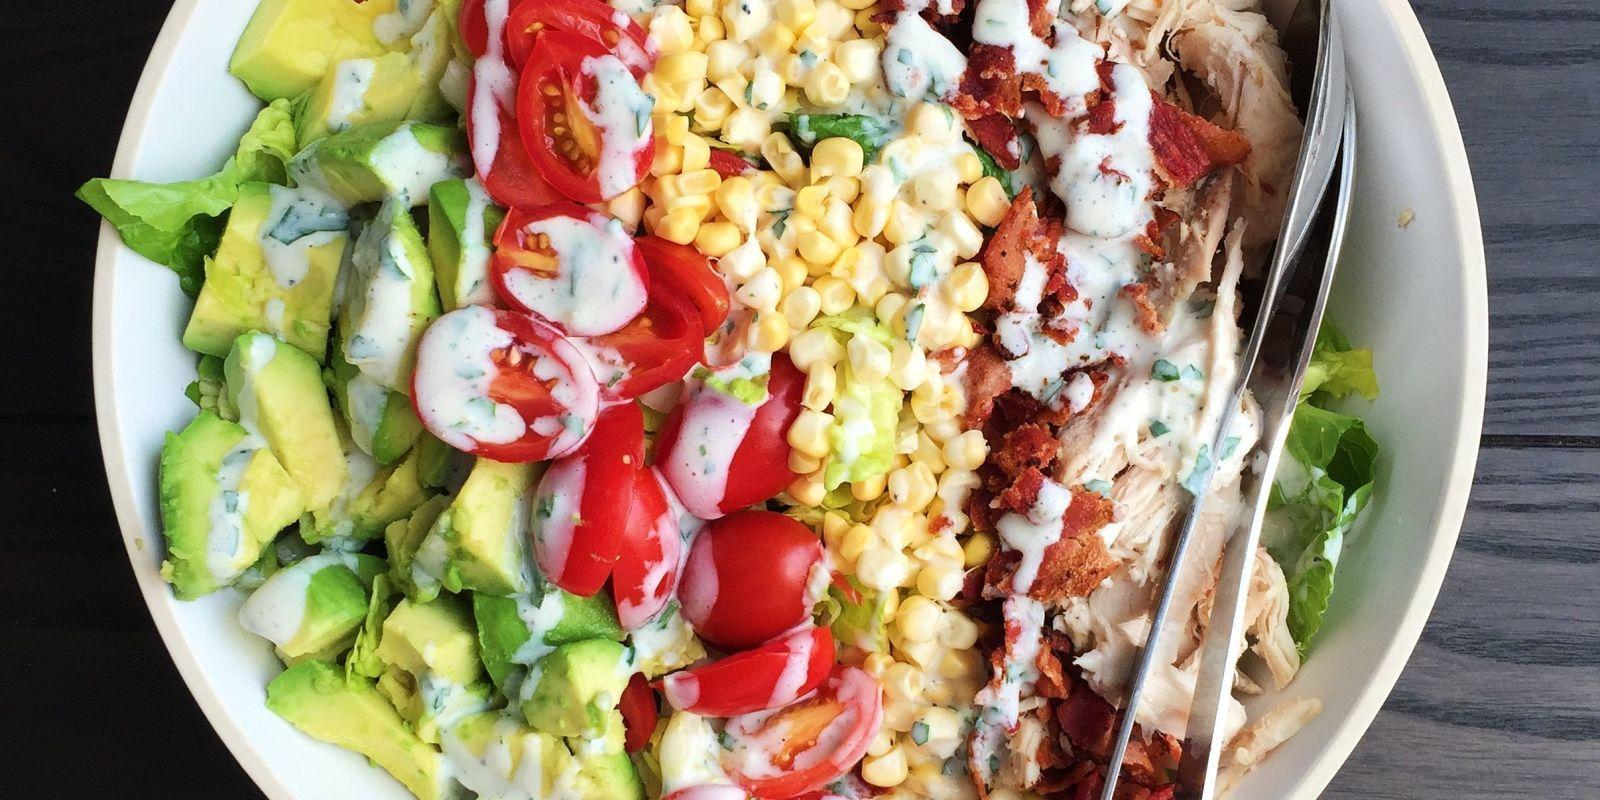 Summery Cobb Salad With Buttermilk Dressing Recipe Dinner Salads Summer Salads Delicious Salads